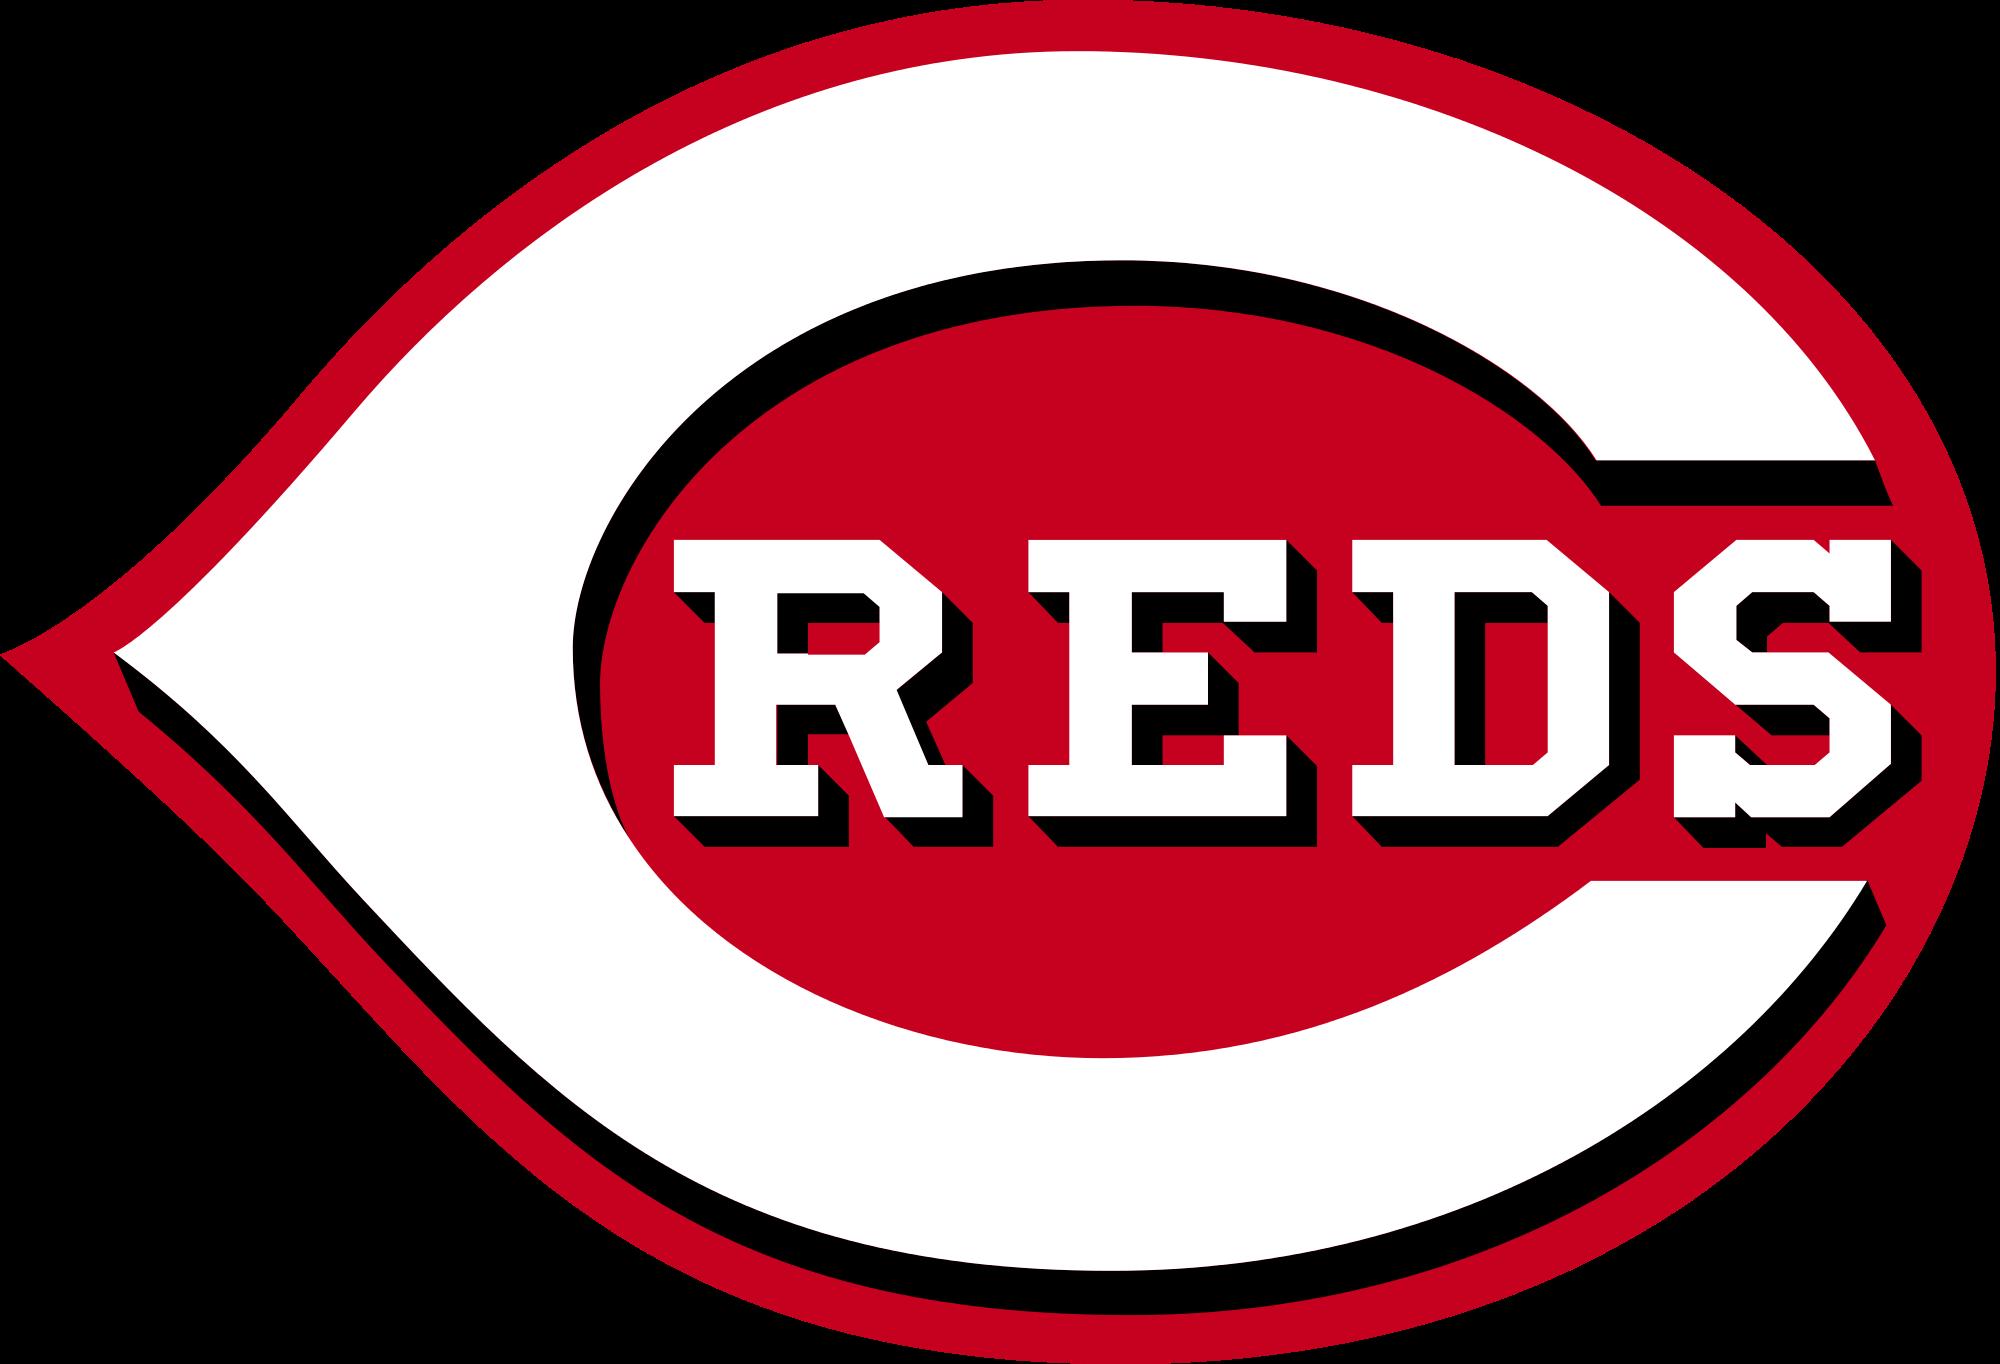 Cincinnati Reds Logo PNG Image.